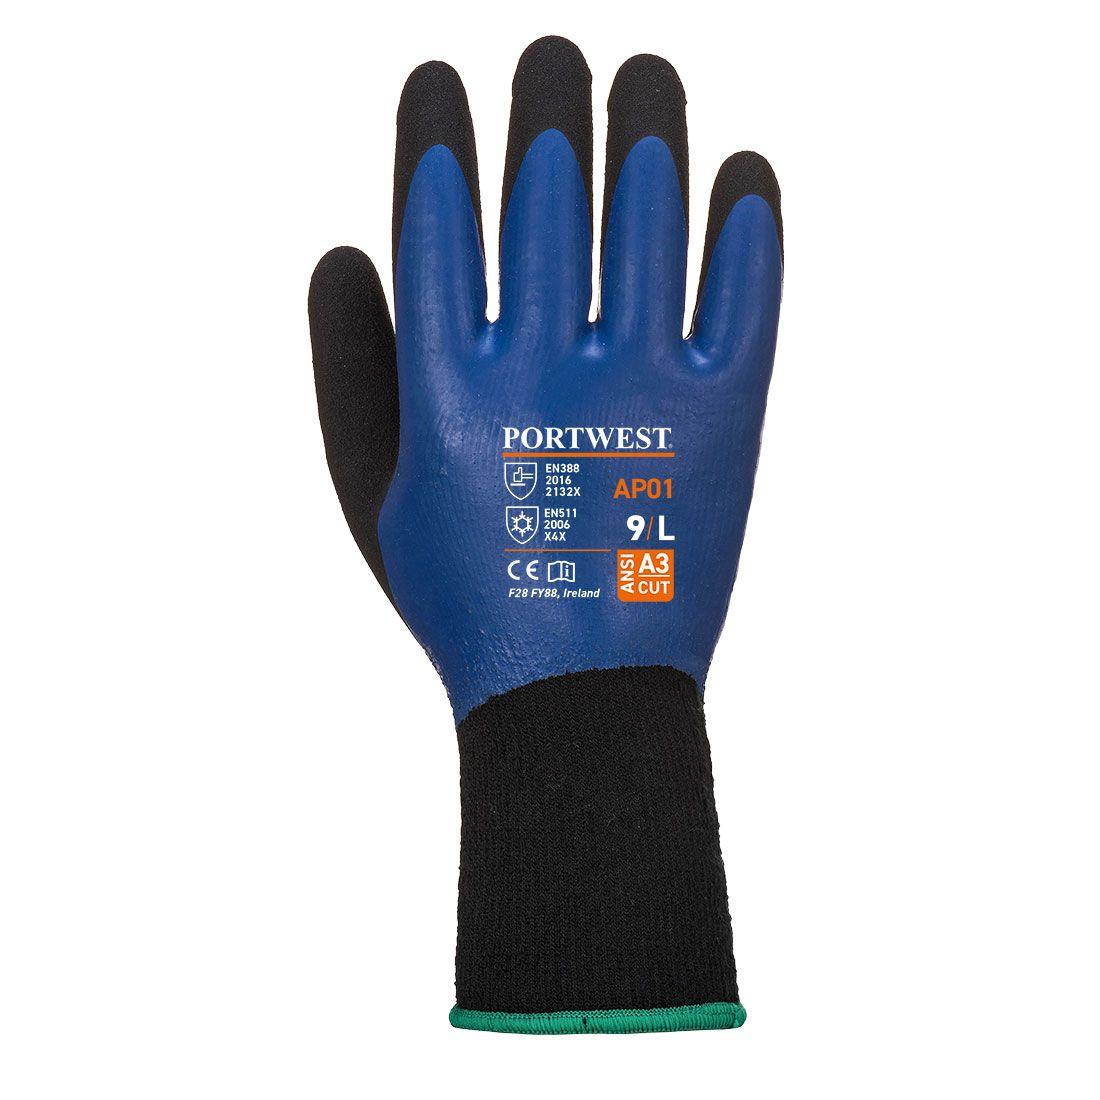 Portwest Handschoenen AP01 blauw-zwart(B8)